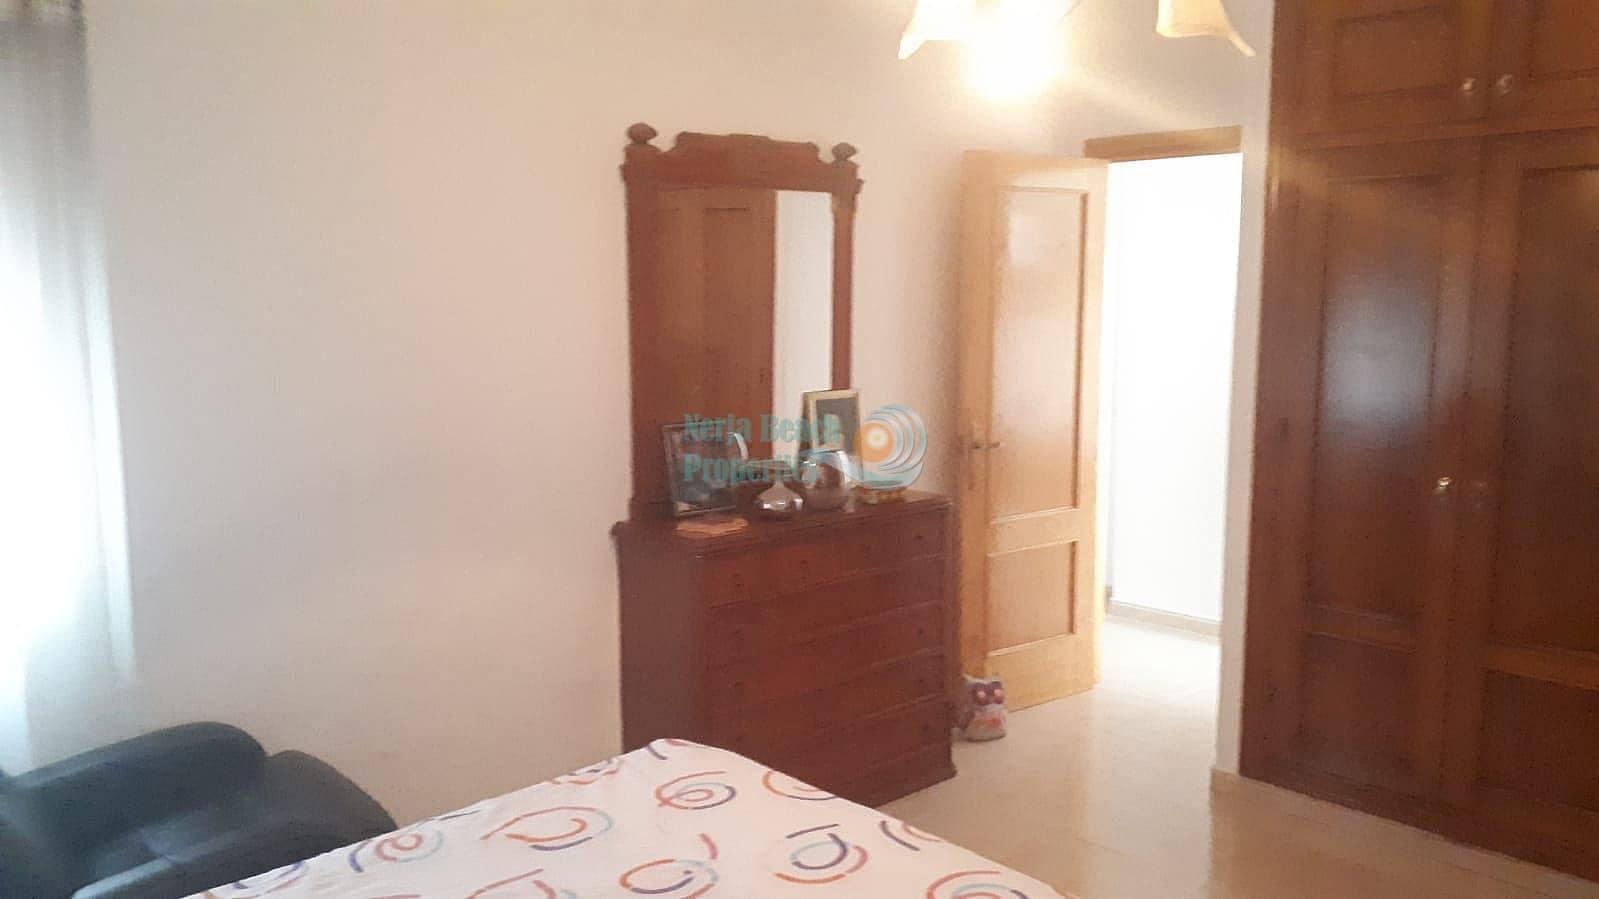 4 bedroom Apartment for sale in Nerja - € 297,000 (Ref: 4772793)